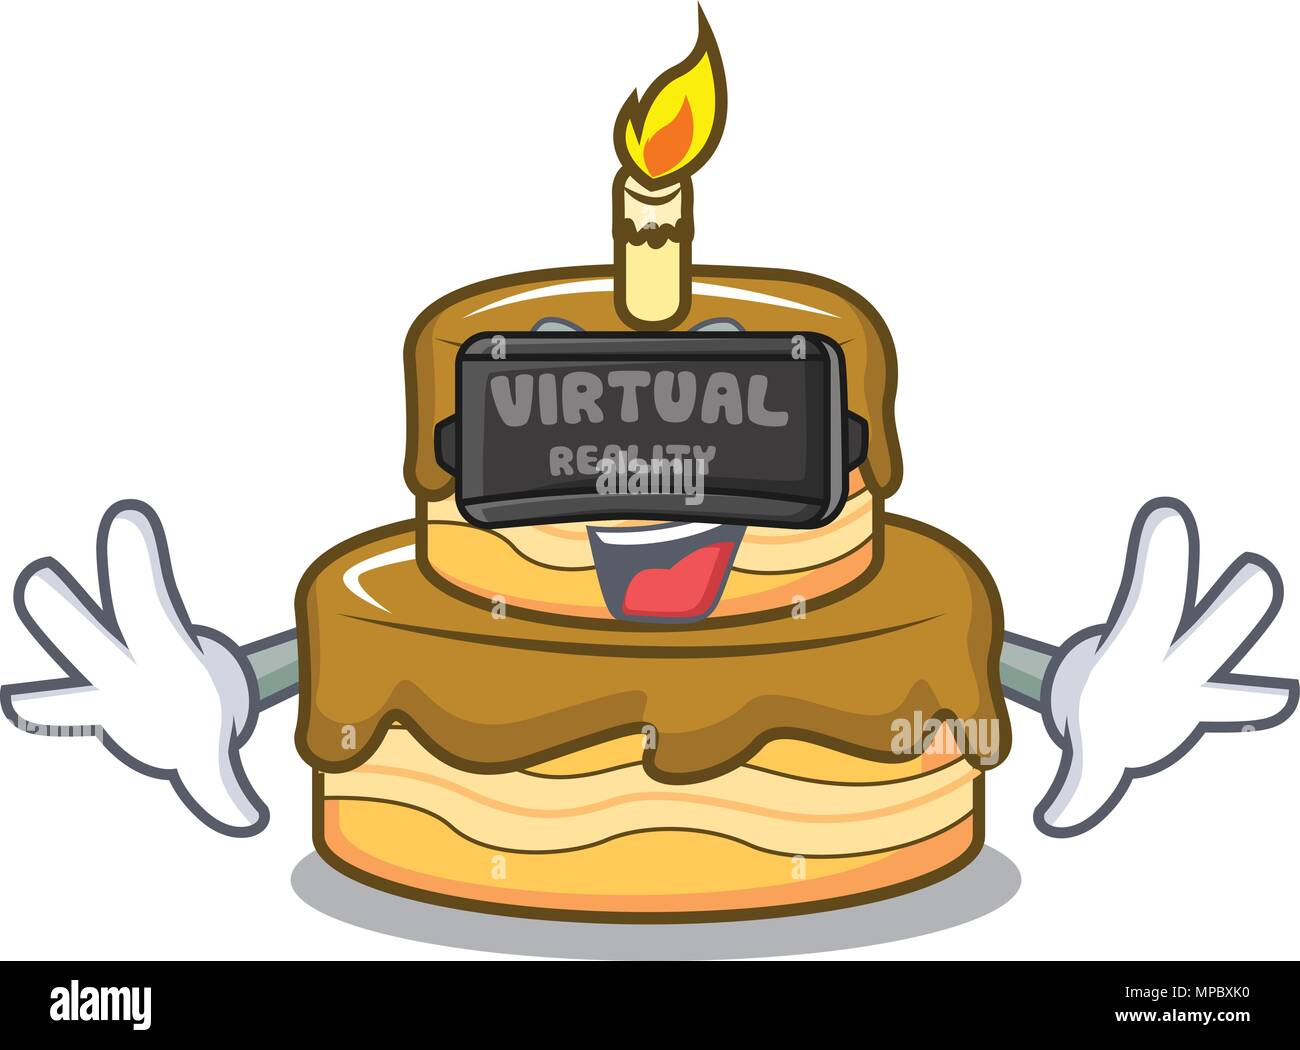 Enjoyable Virtual Reality Birthday Cake Mascot Cartoon Stock Vector Art Funny Birthday Cards Online Barepcheapnameinfo